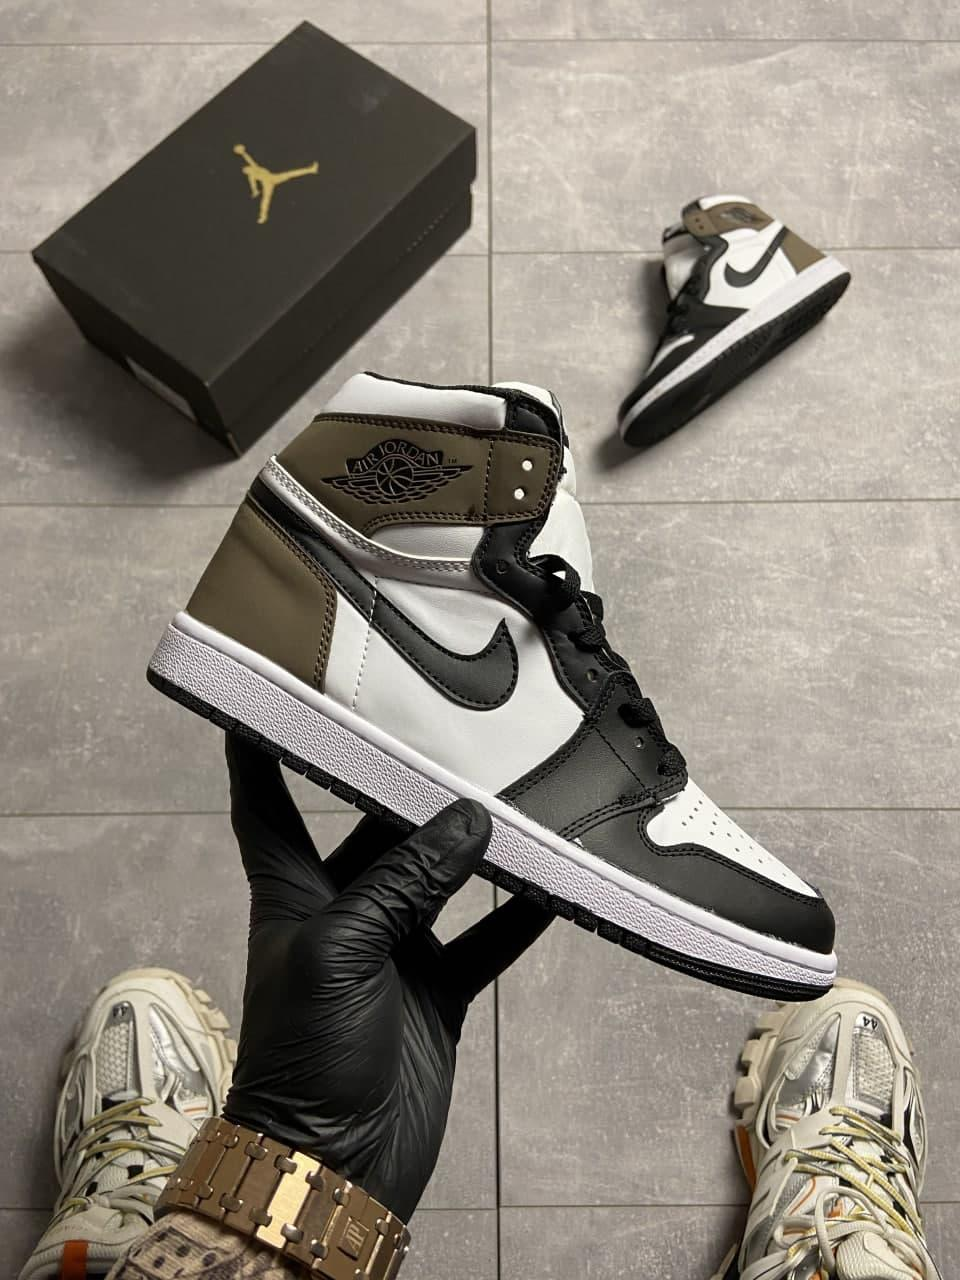 Nike Air Jordan 1 Darck Mocha (Белый Коричневый)